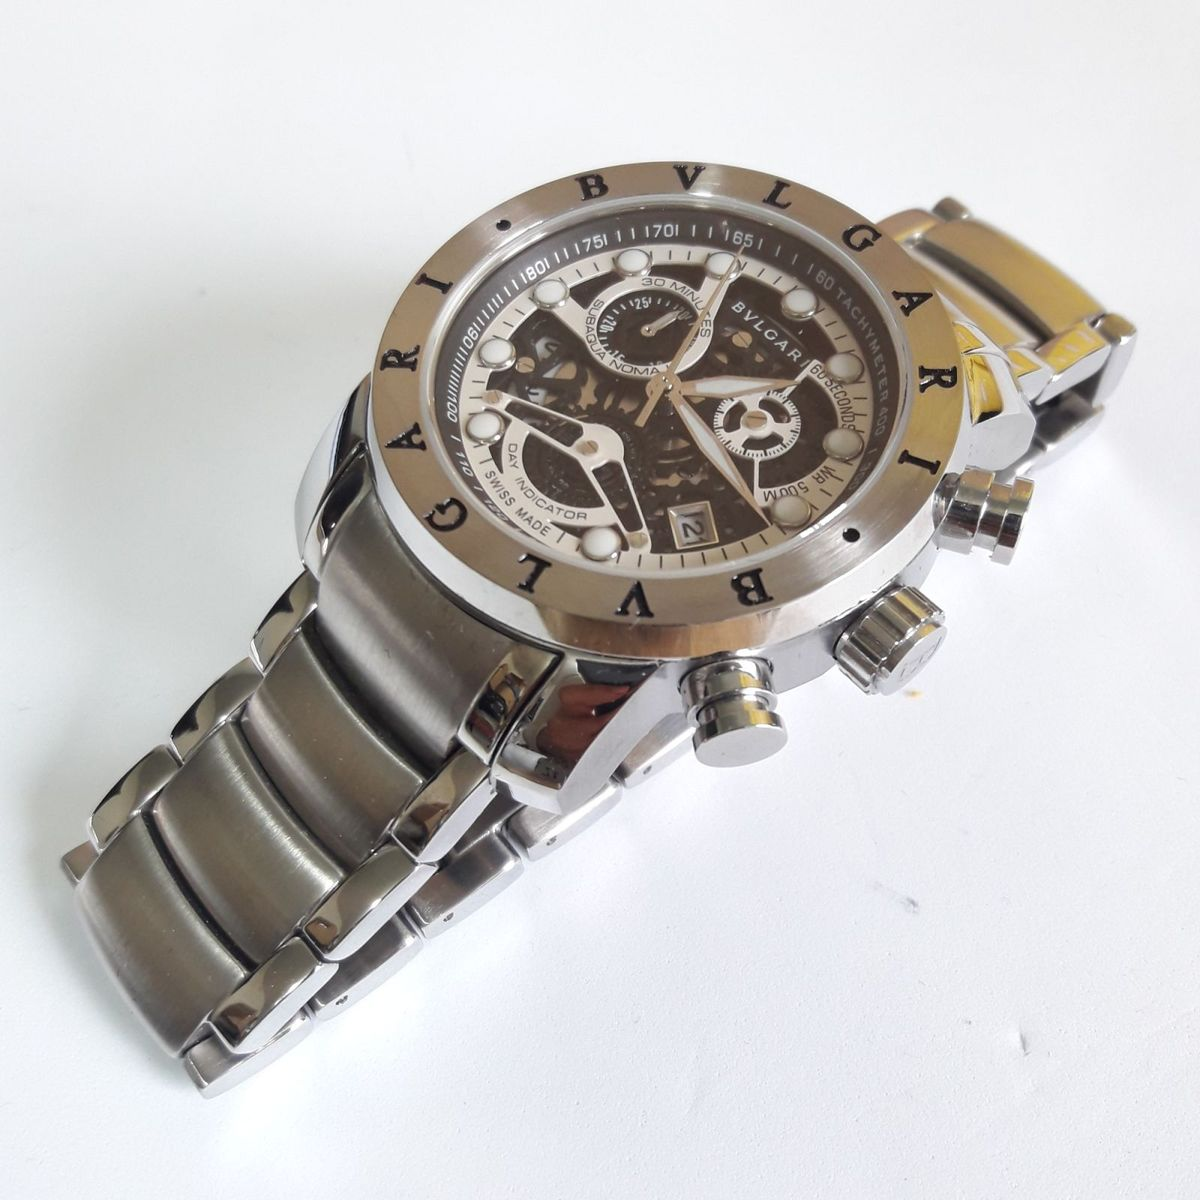 a78f5ca1d2b77 relógio bvlgari subaqua skeleton prata com preto!!!! - relógios bvlgari